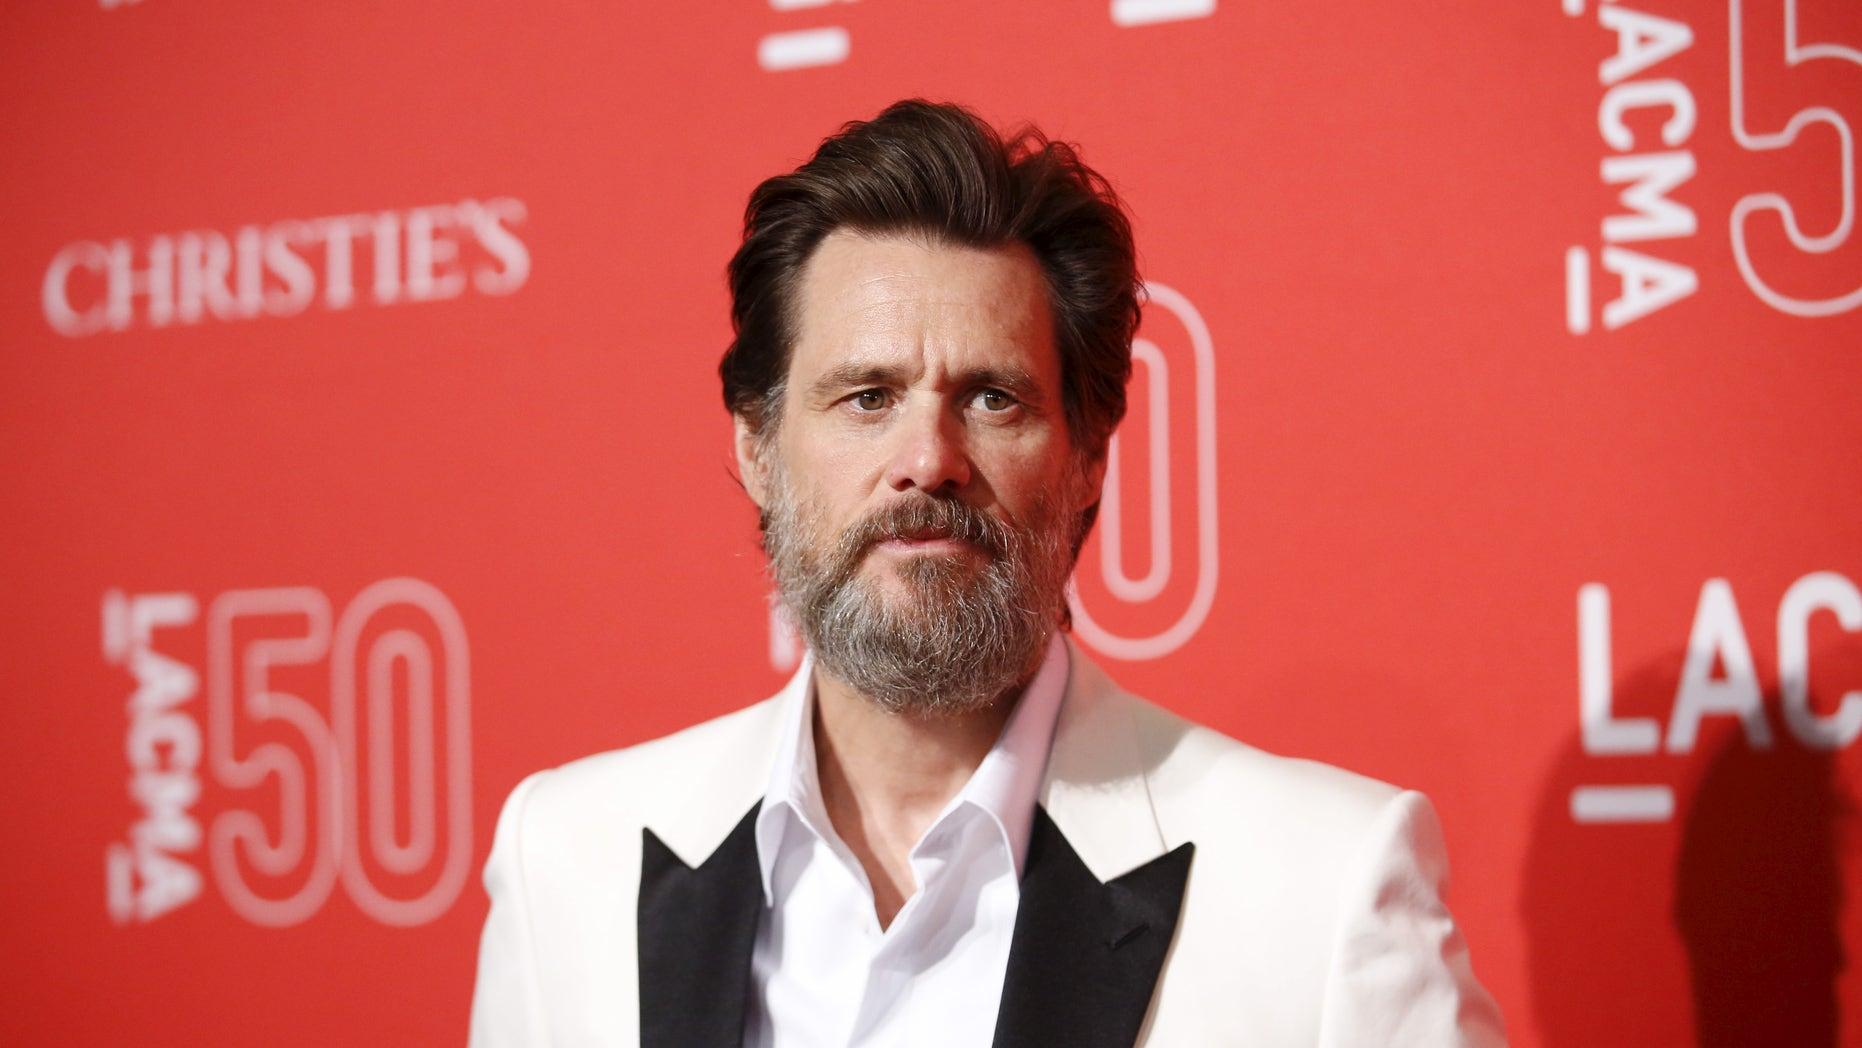 April 18, 2015. Actor Jim Carrey poses at LACMA's 50th anniversary gala in Los Angeles, California.